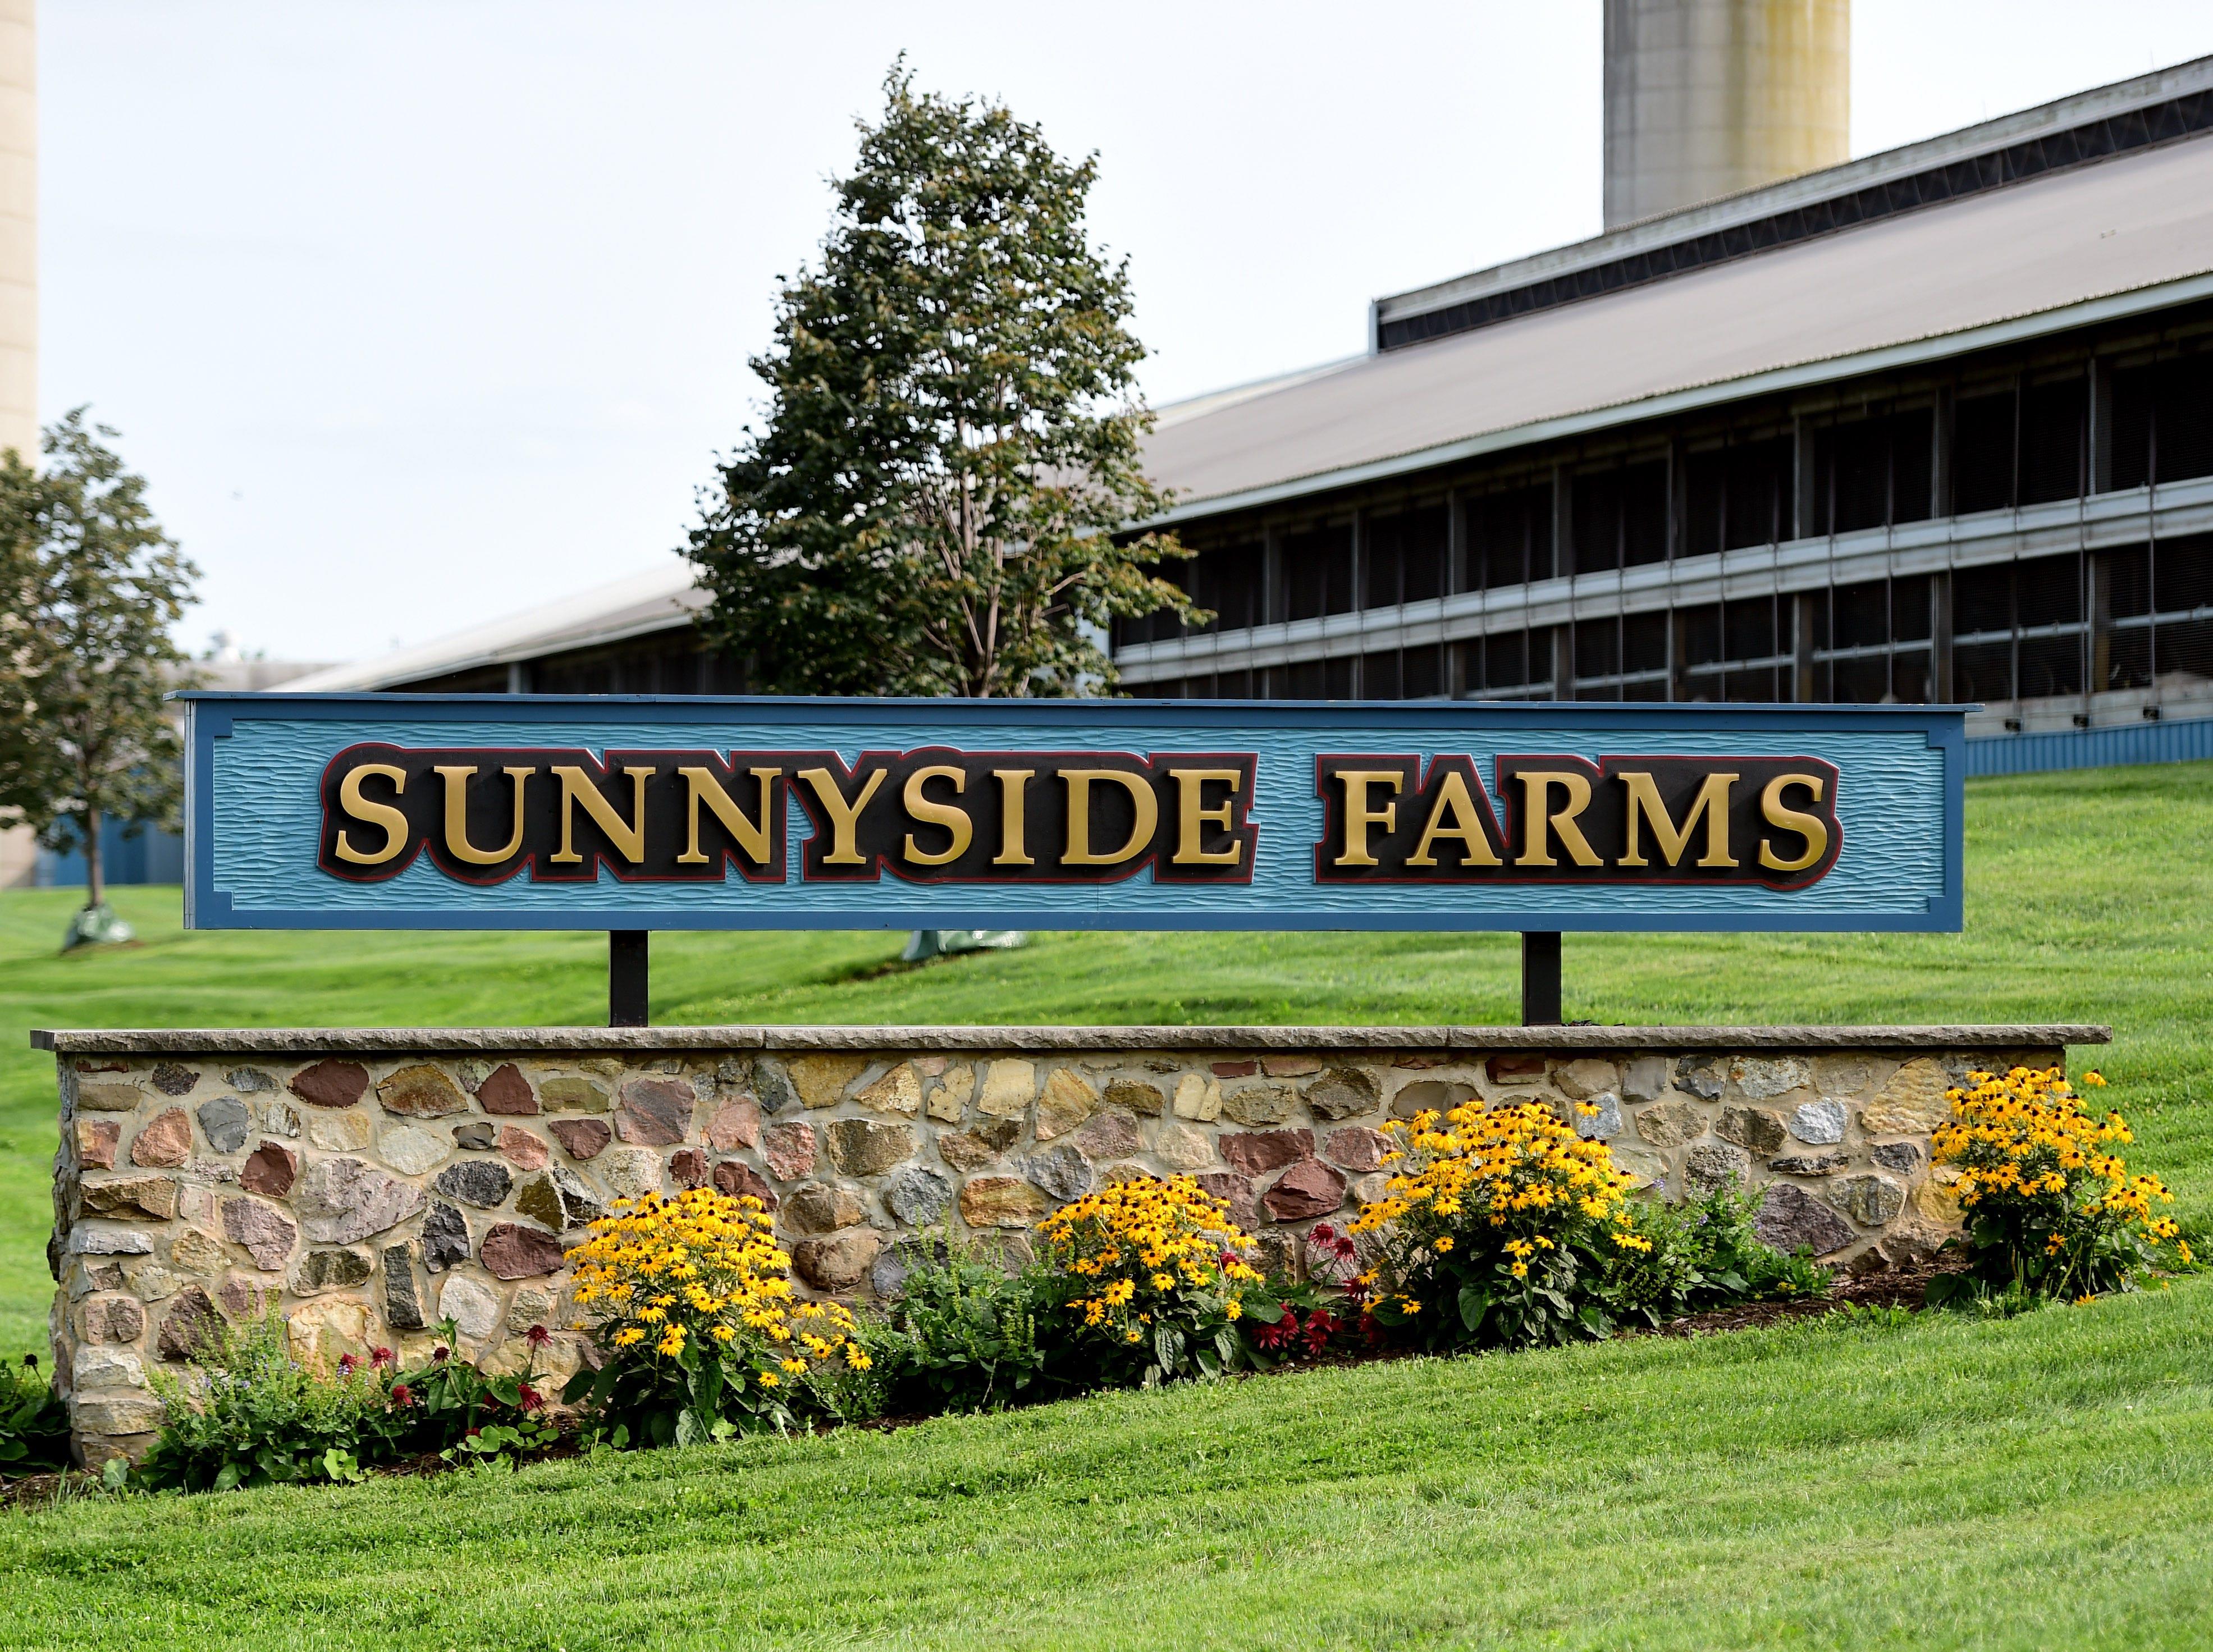 Sunnyside Farms in Scipio Center, NY, Monday, August 20, 2018.